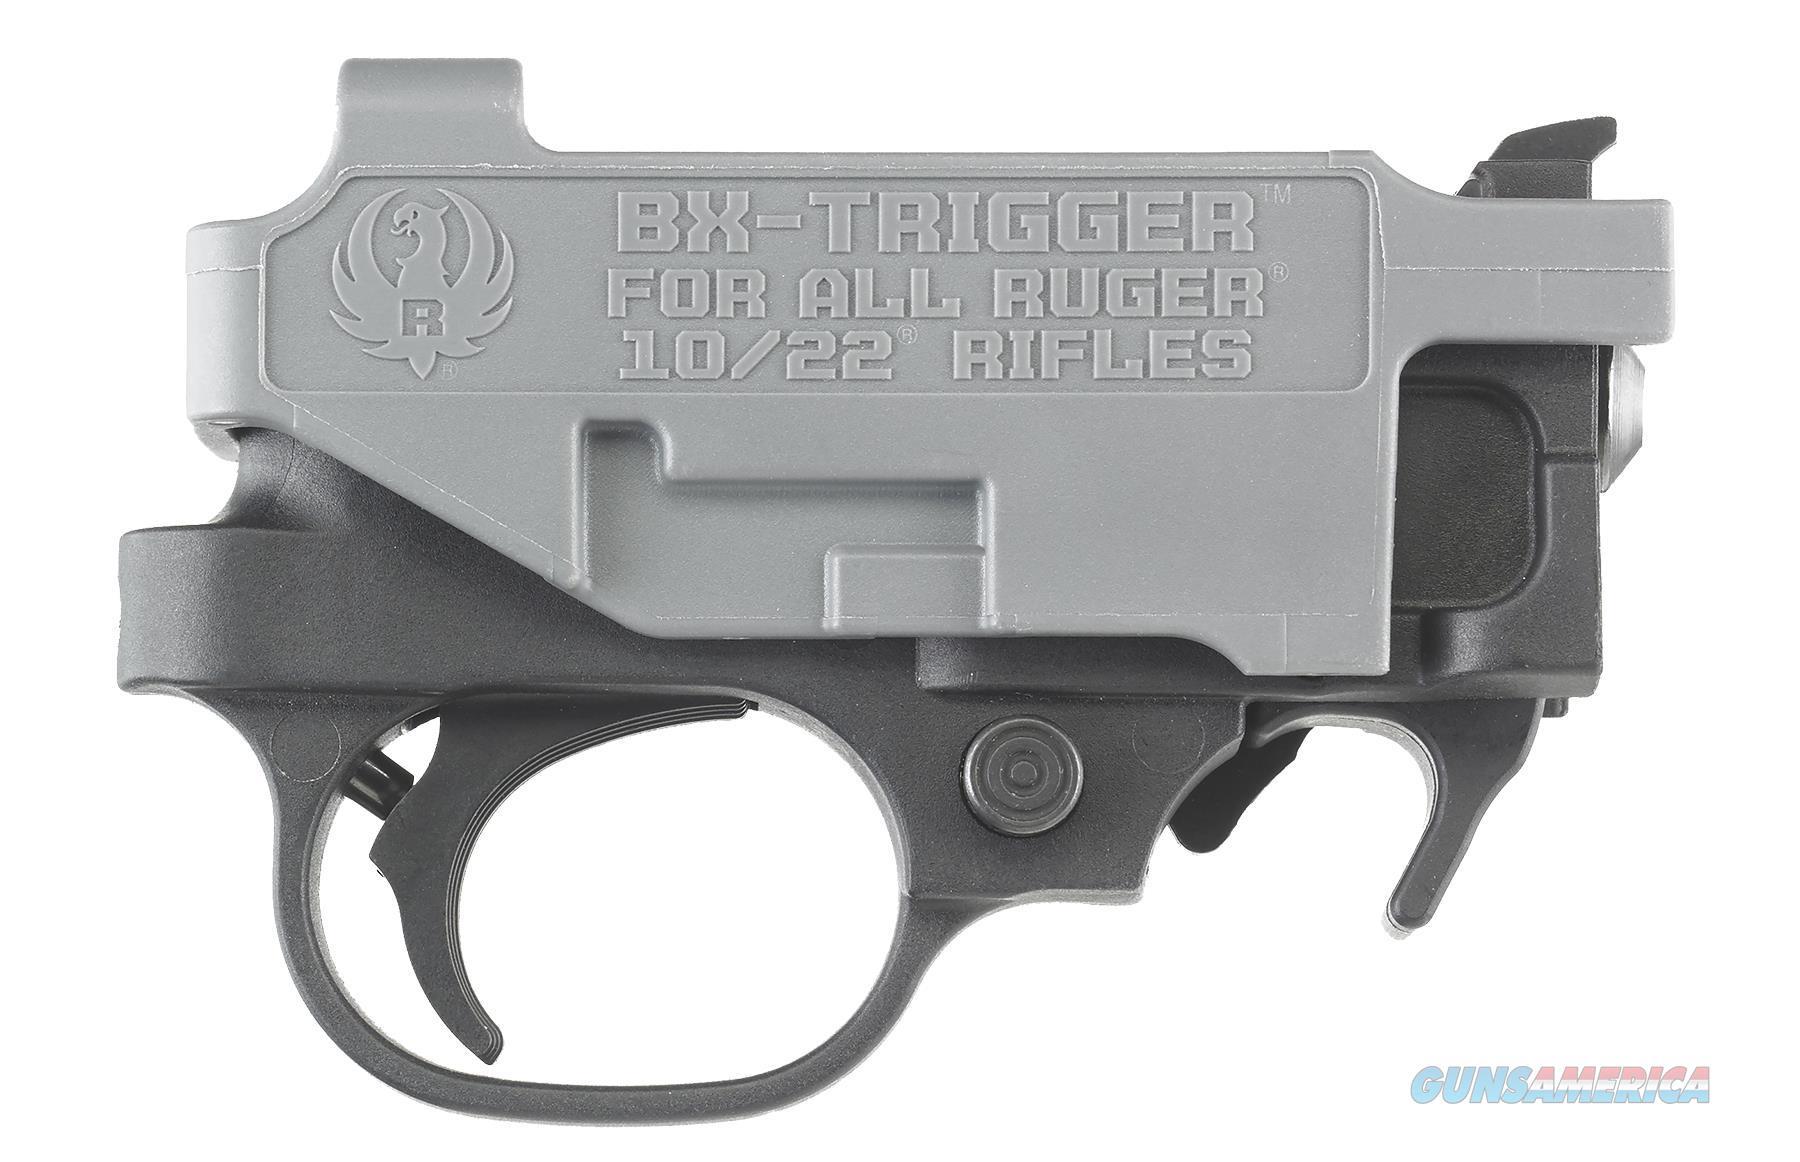 Ruger 90462 Bx Trigger 10/22  And 22 Charger Trigger  Standard  Metal Black 90462  Non-Guns > Gun Parts > Misc > Rifles